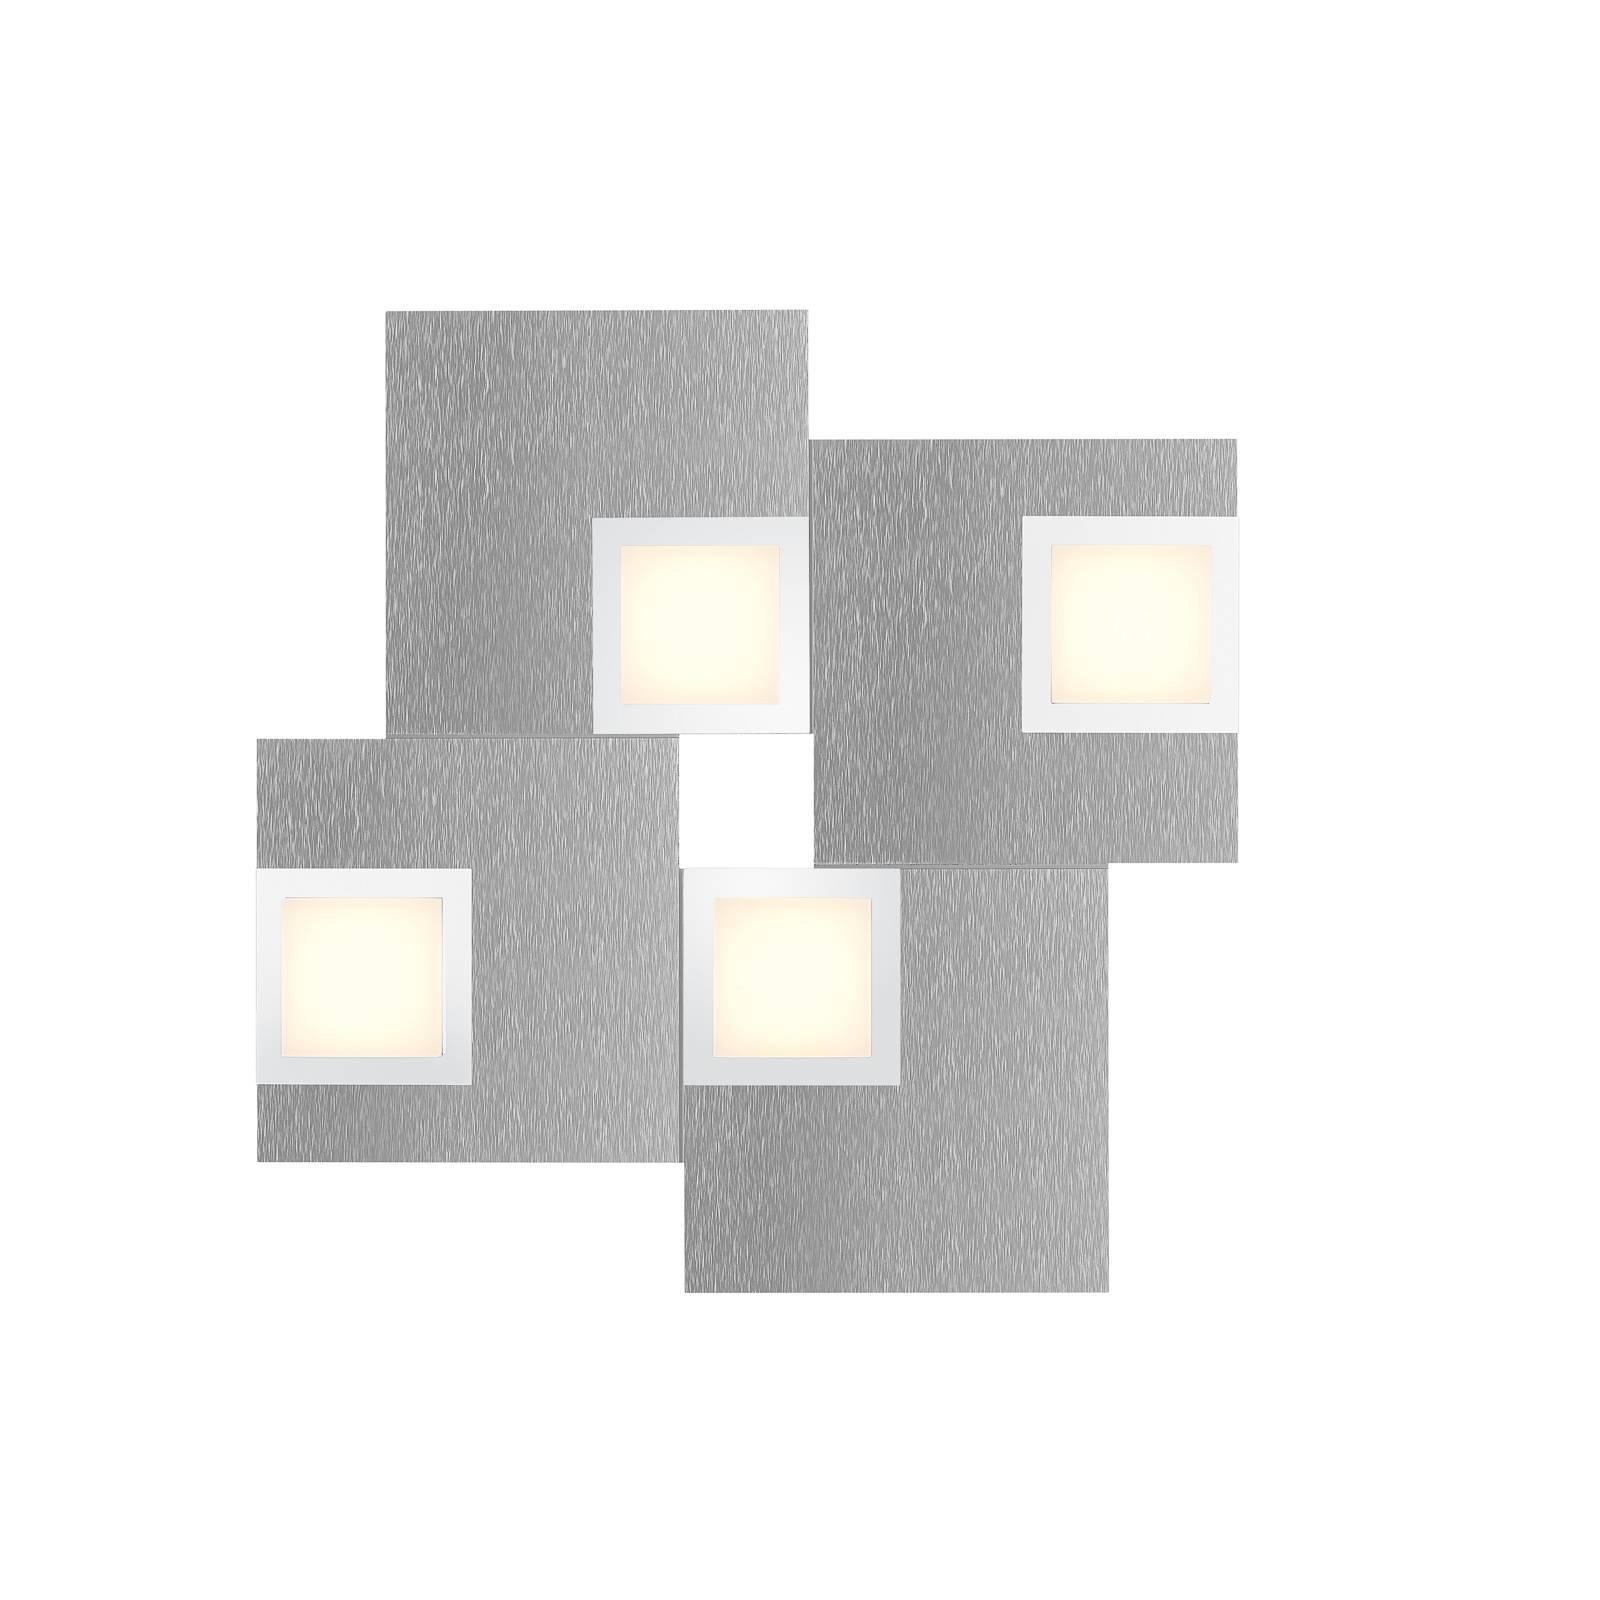 BANKAMP New Quadro taklampe 4-lk. aluminium